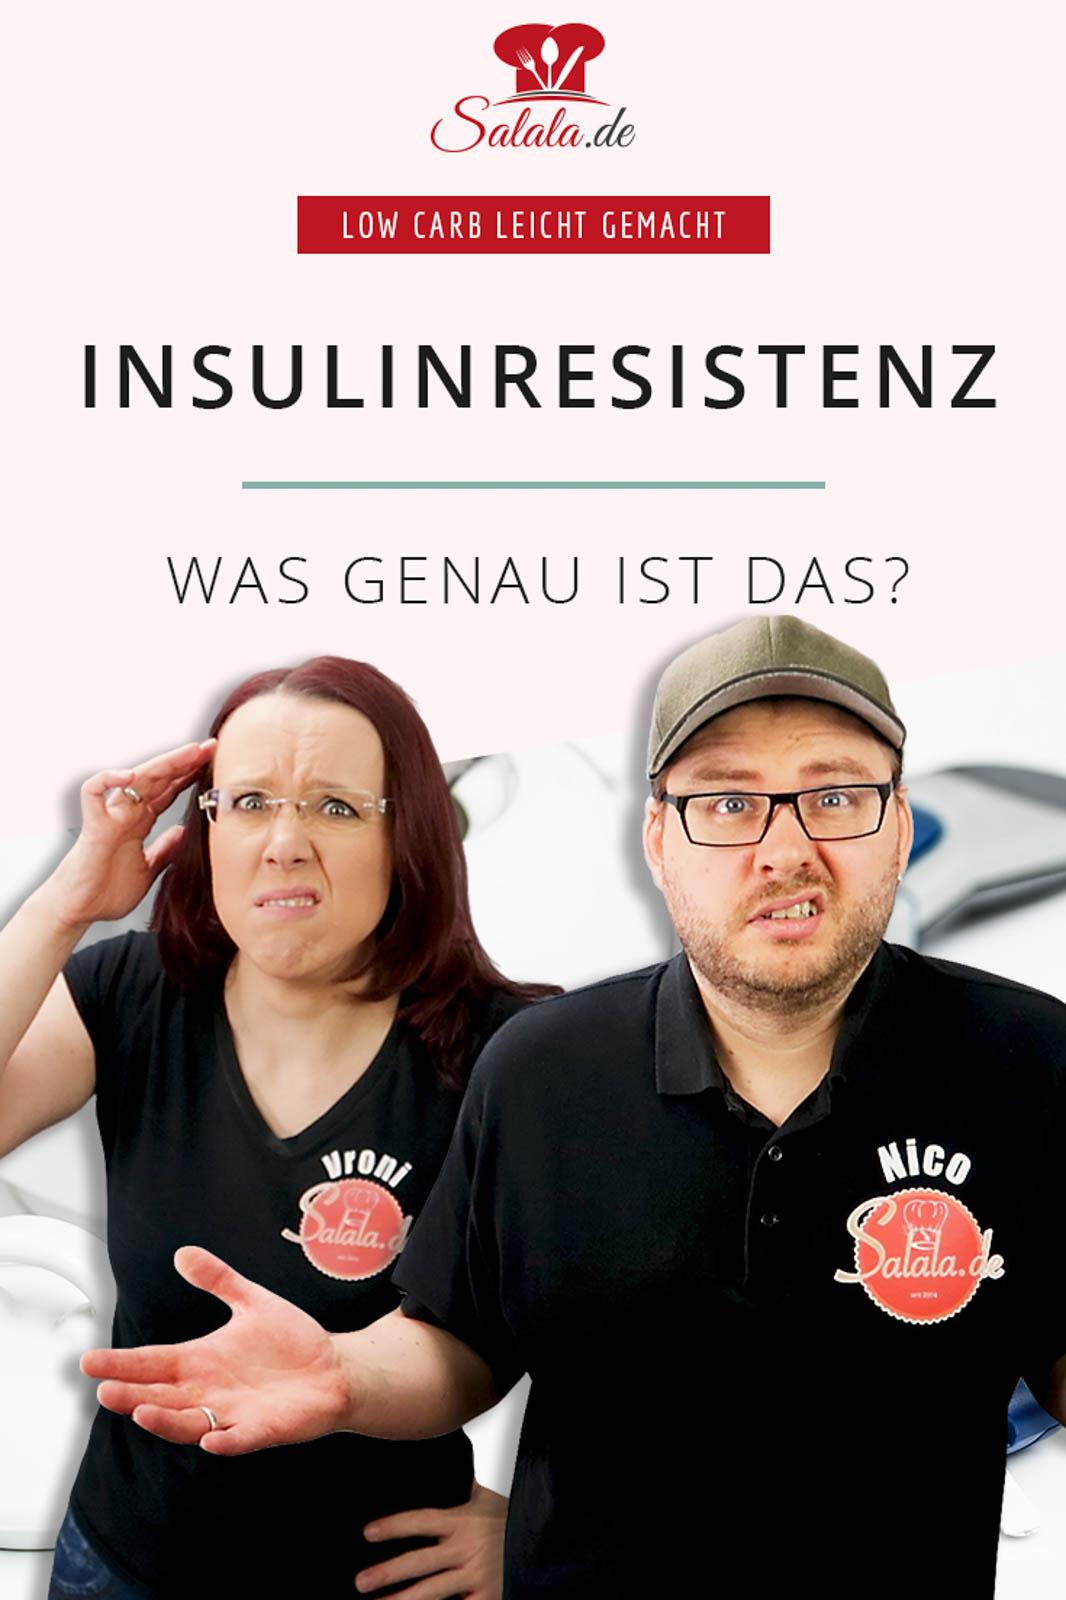 #Insulinresistenz #diabetes #lowcarb ##wasistinsulinresistenz #insulinresistenzrückgängigmachen #hilfebeiinsulinresistenz #salalade